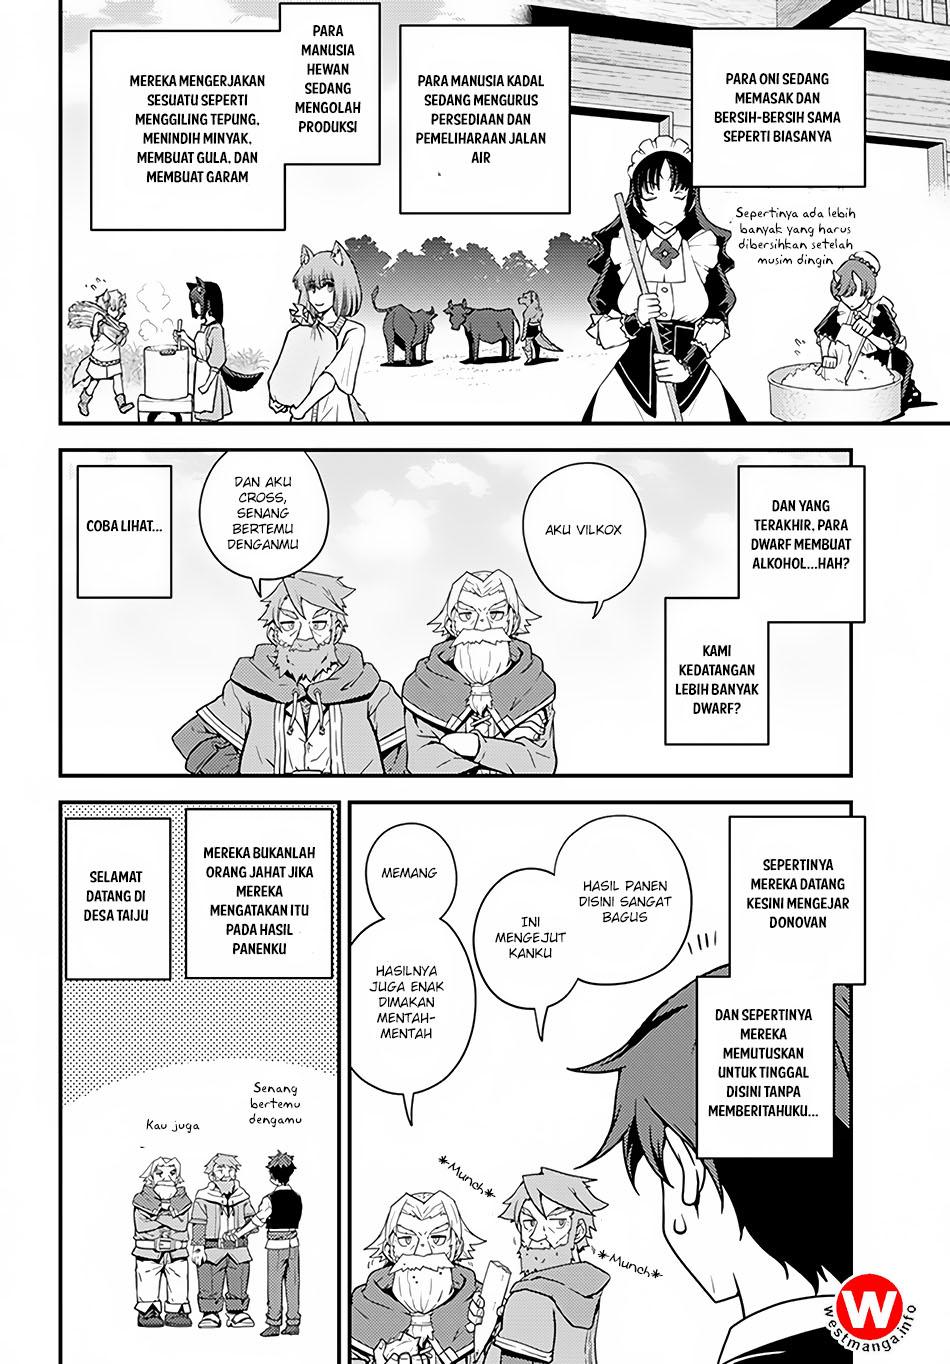 Komik isekai nonbiri nouka 029 - chapter 29 30 Indonesia isekai nonbiri nouka 029 - chapter 29 Terbaru 10|Baca Manga Komik Indonesia